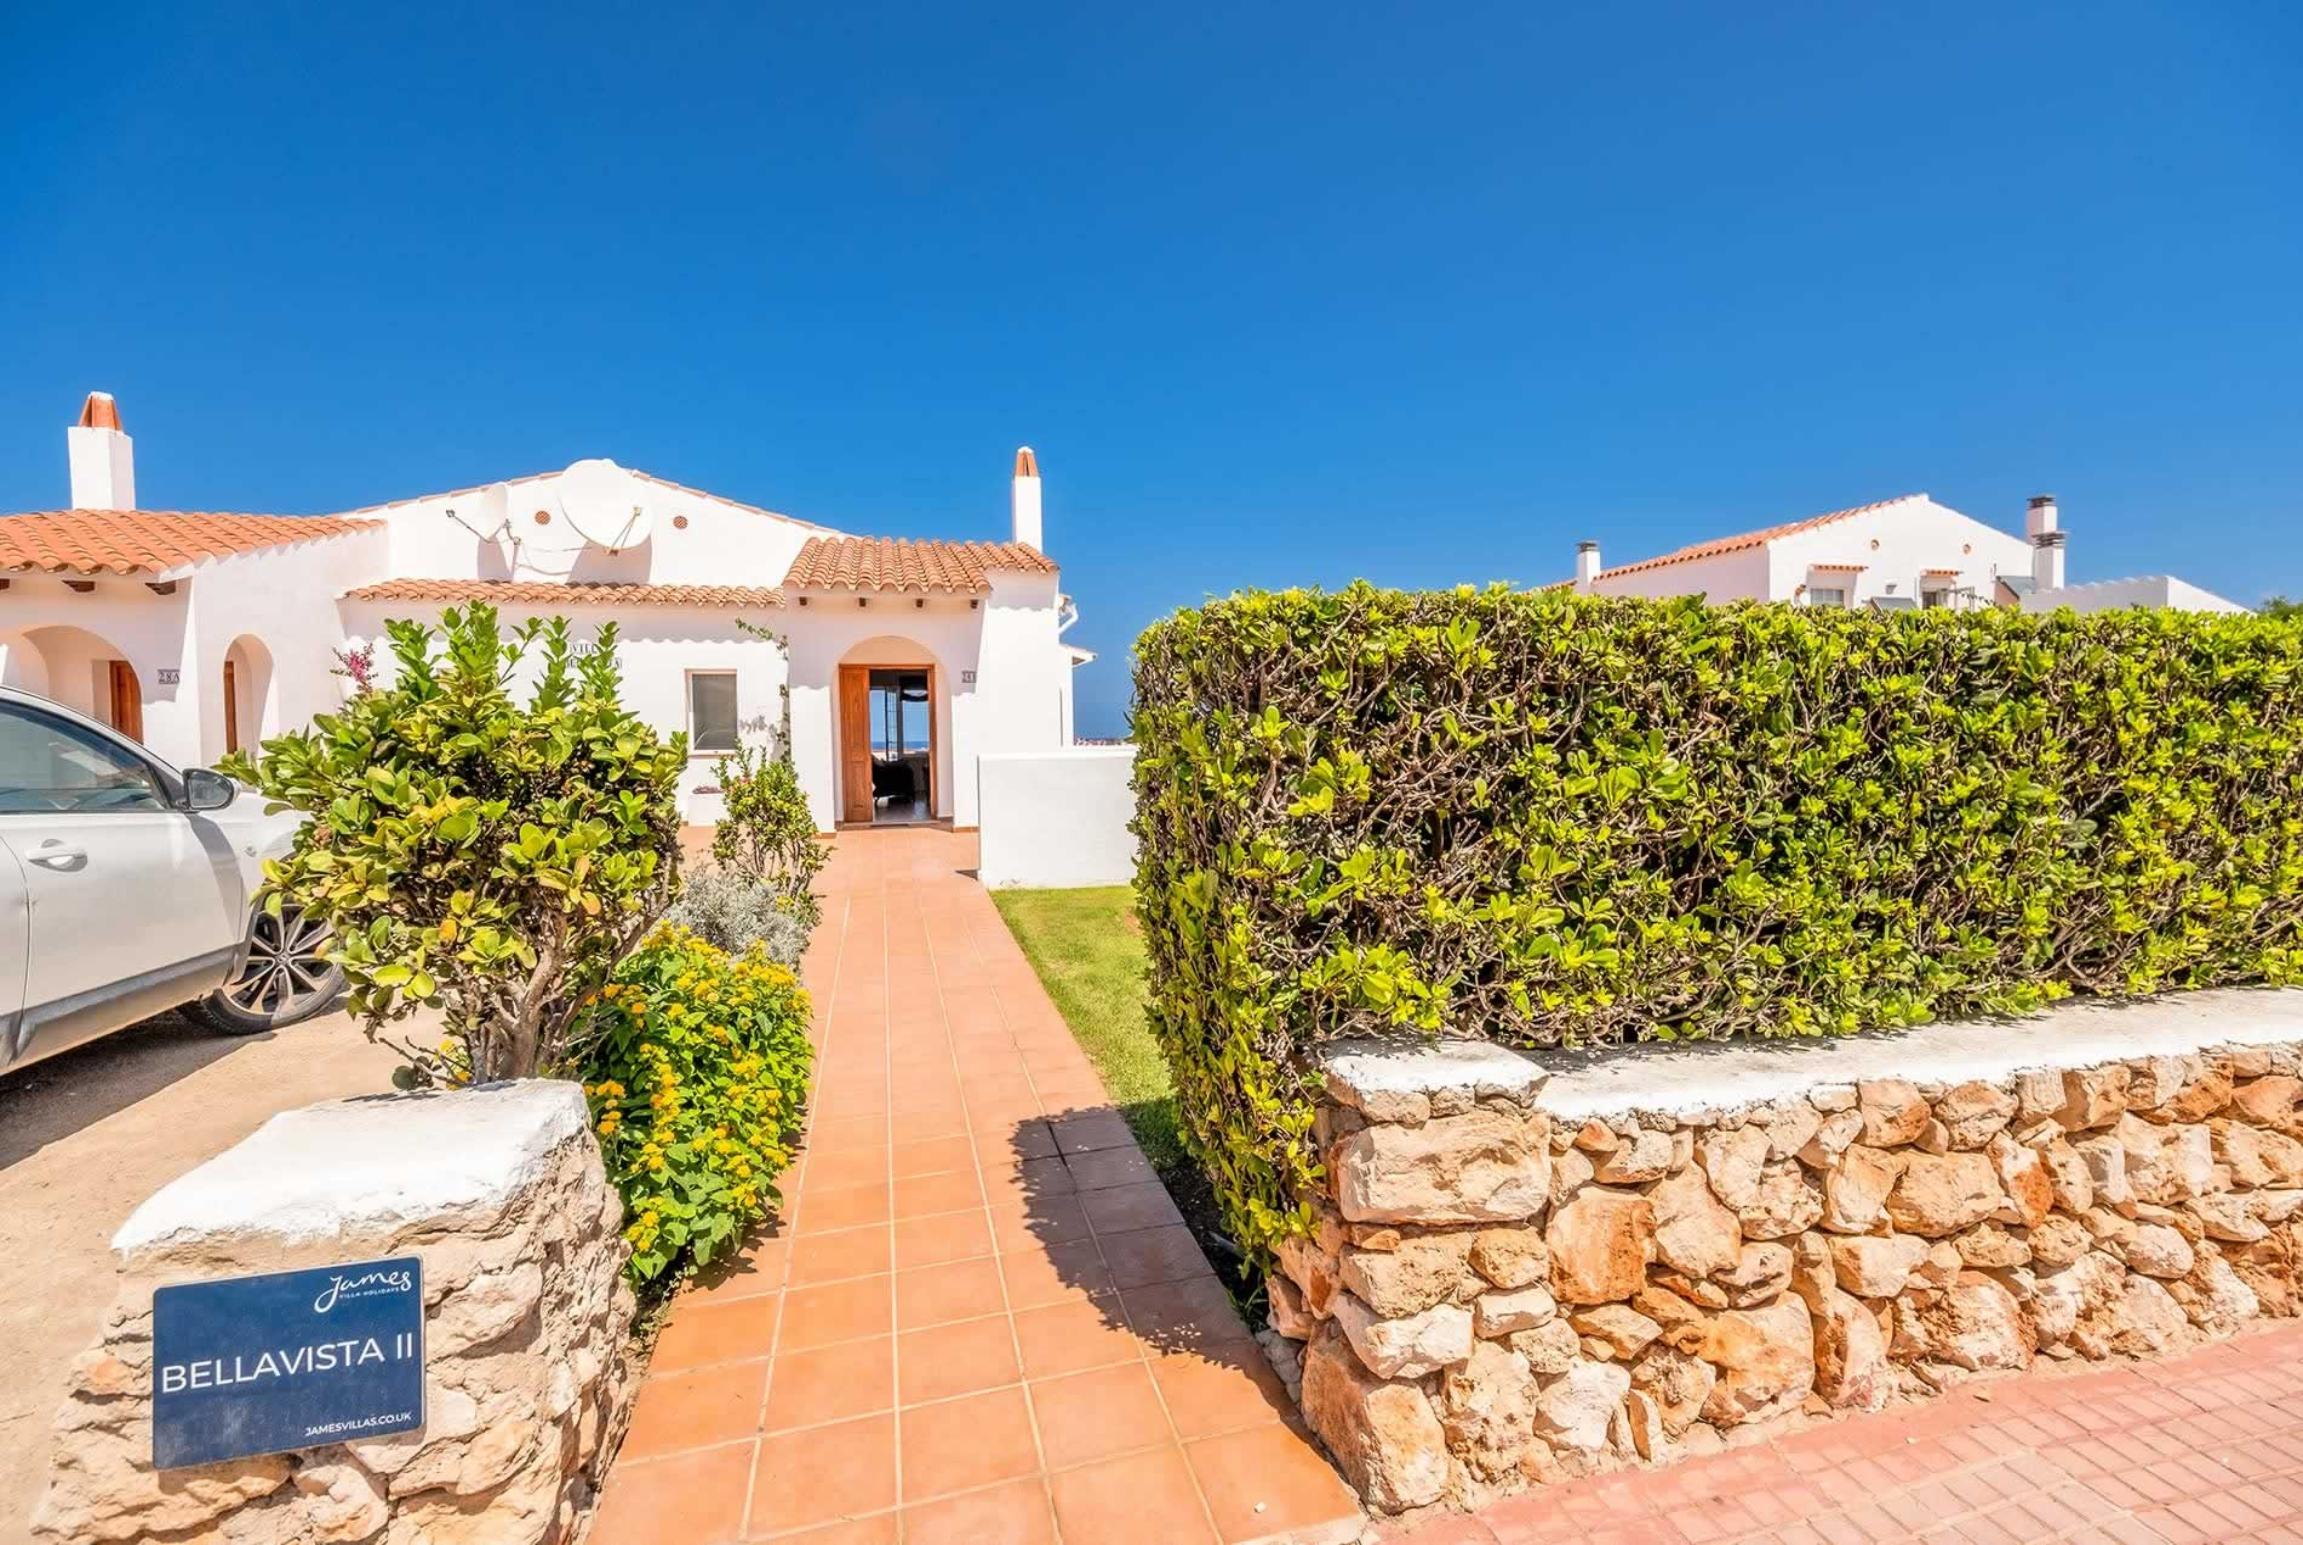 Ferienhaus Bellavista II (2654270), Arenal De'N Castell, Menorca, Balearische Inseln, Spanien, Bild 40